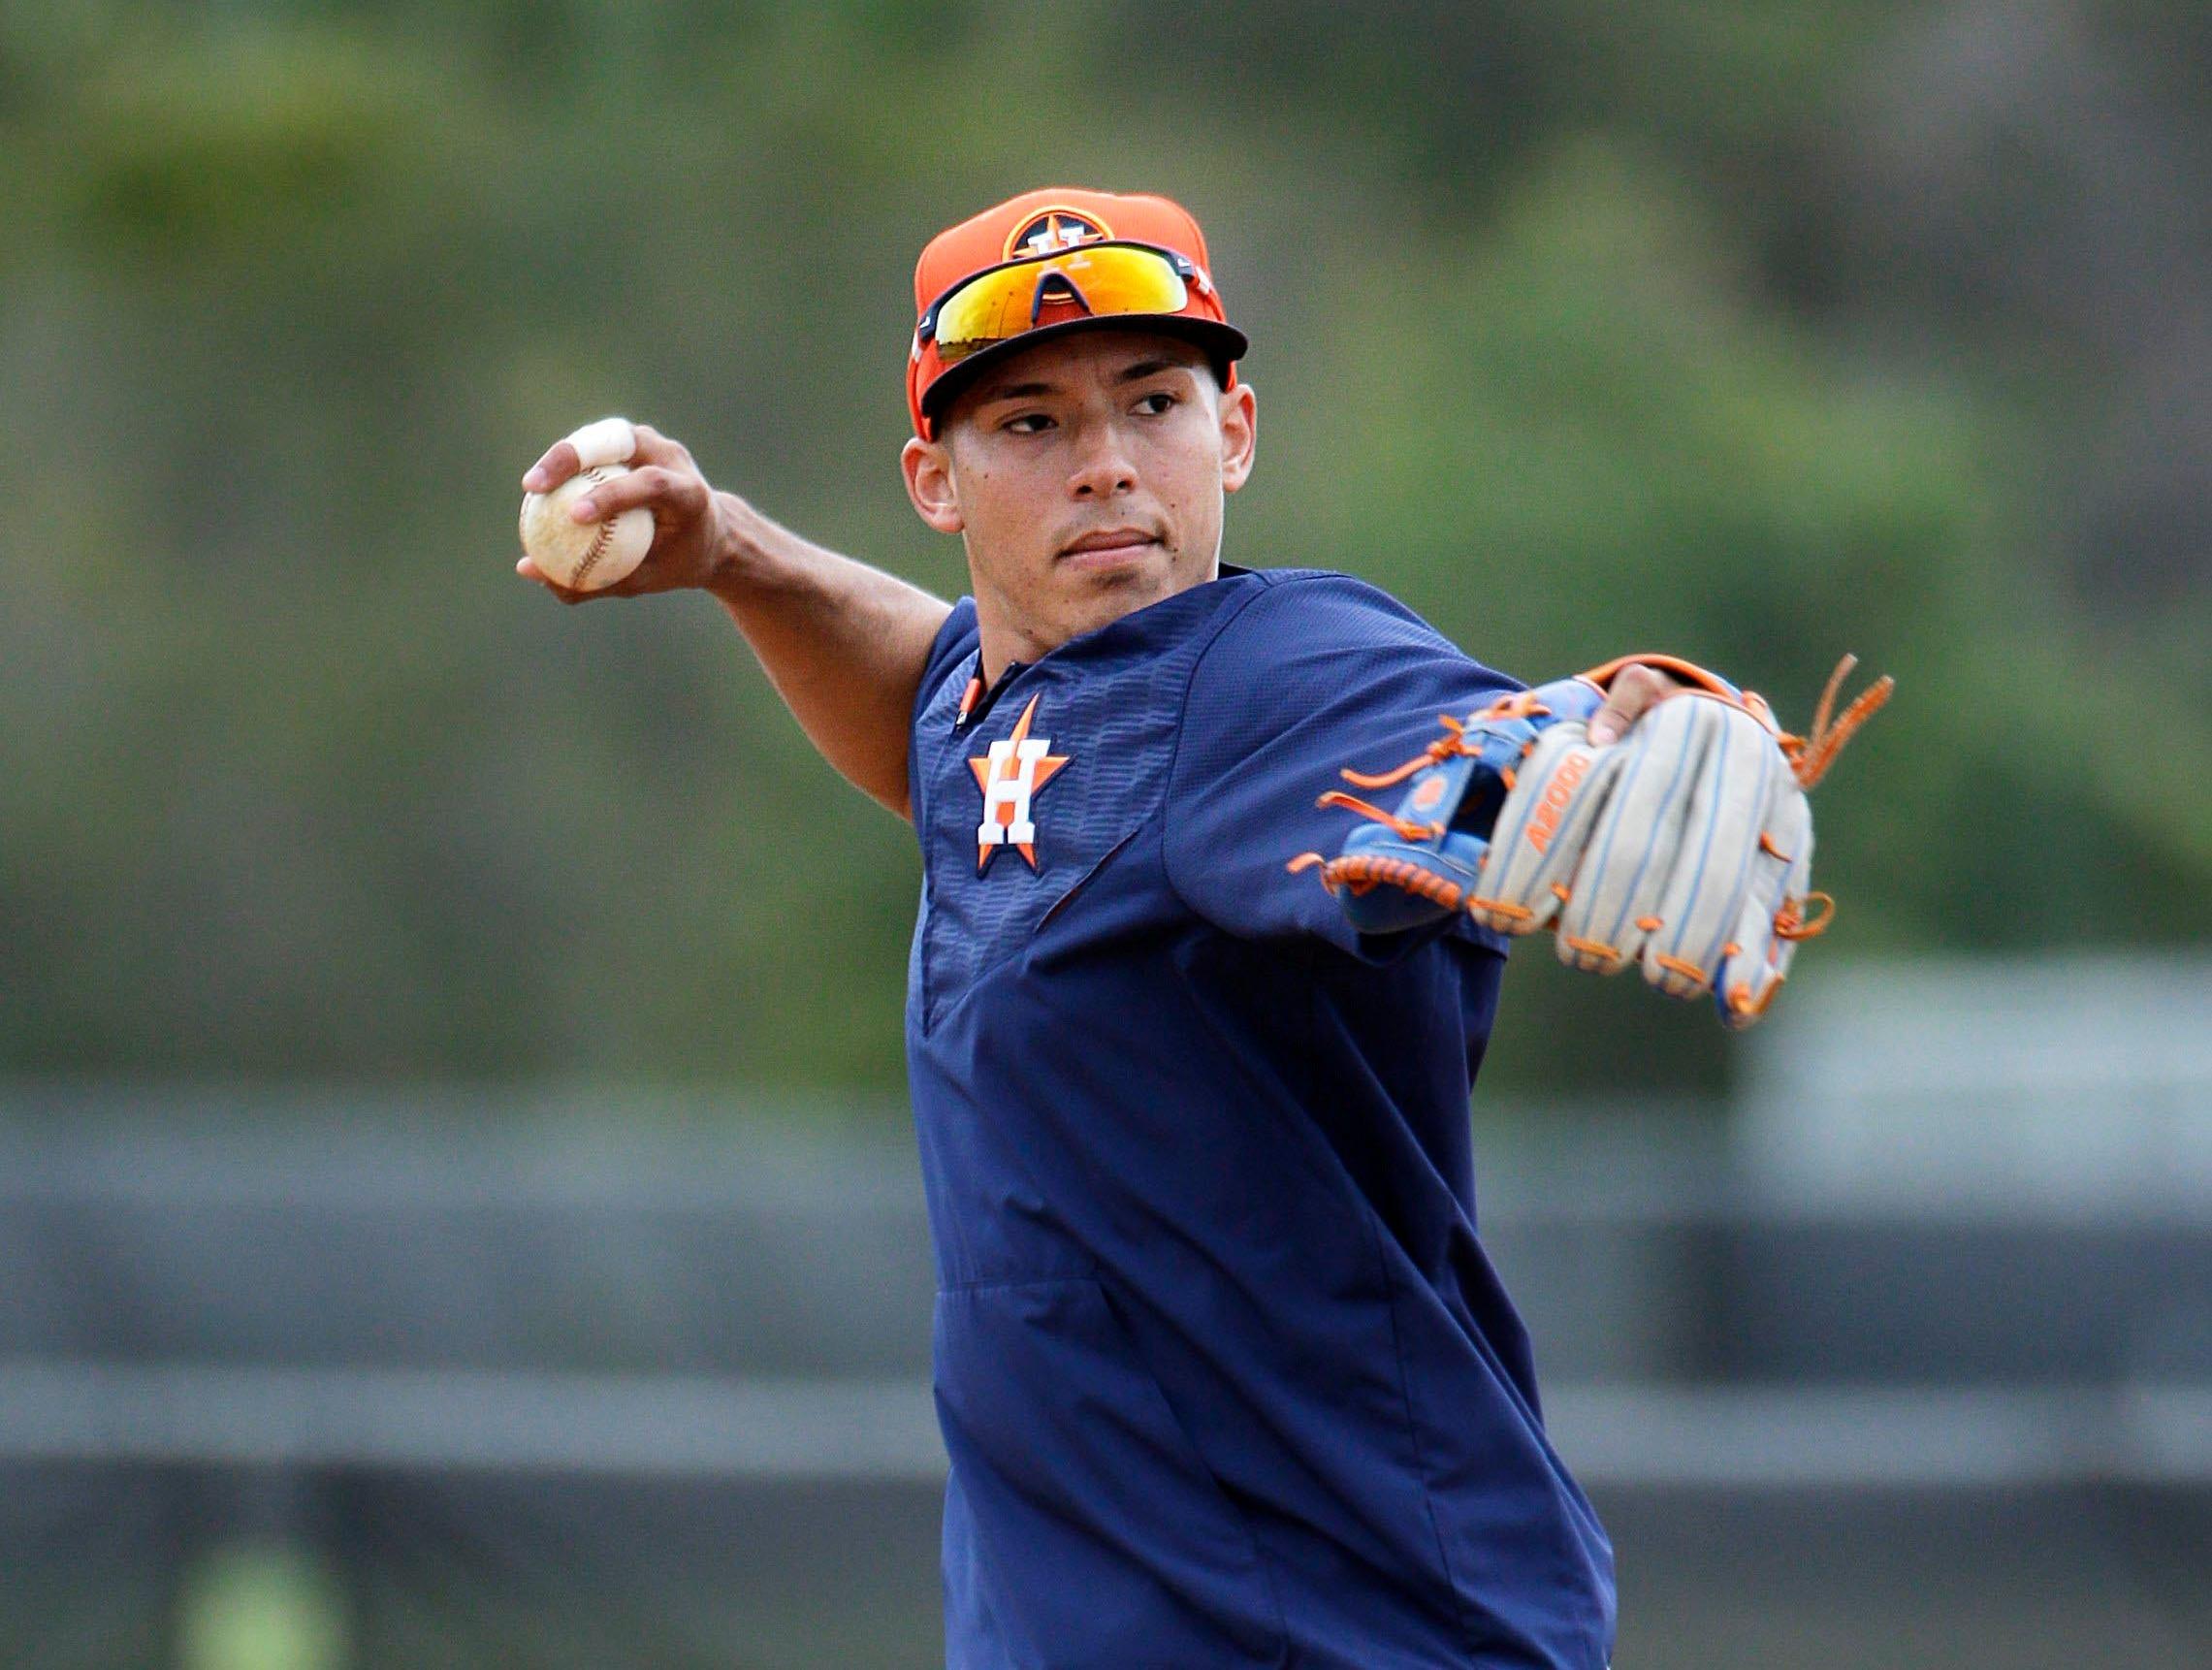 Houston Astros' Carlos Correa fields a ground ball during a spring training baseball workout, Thursday, Feb. 26, 2015, in Kissimmee, Fla. (AP Photo/David Goldman)